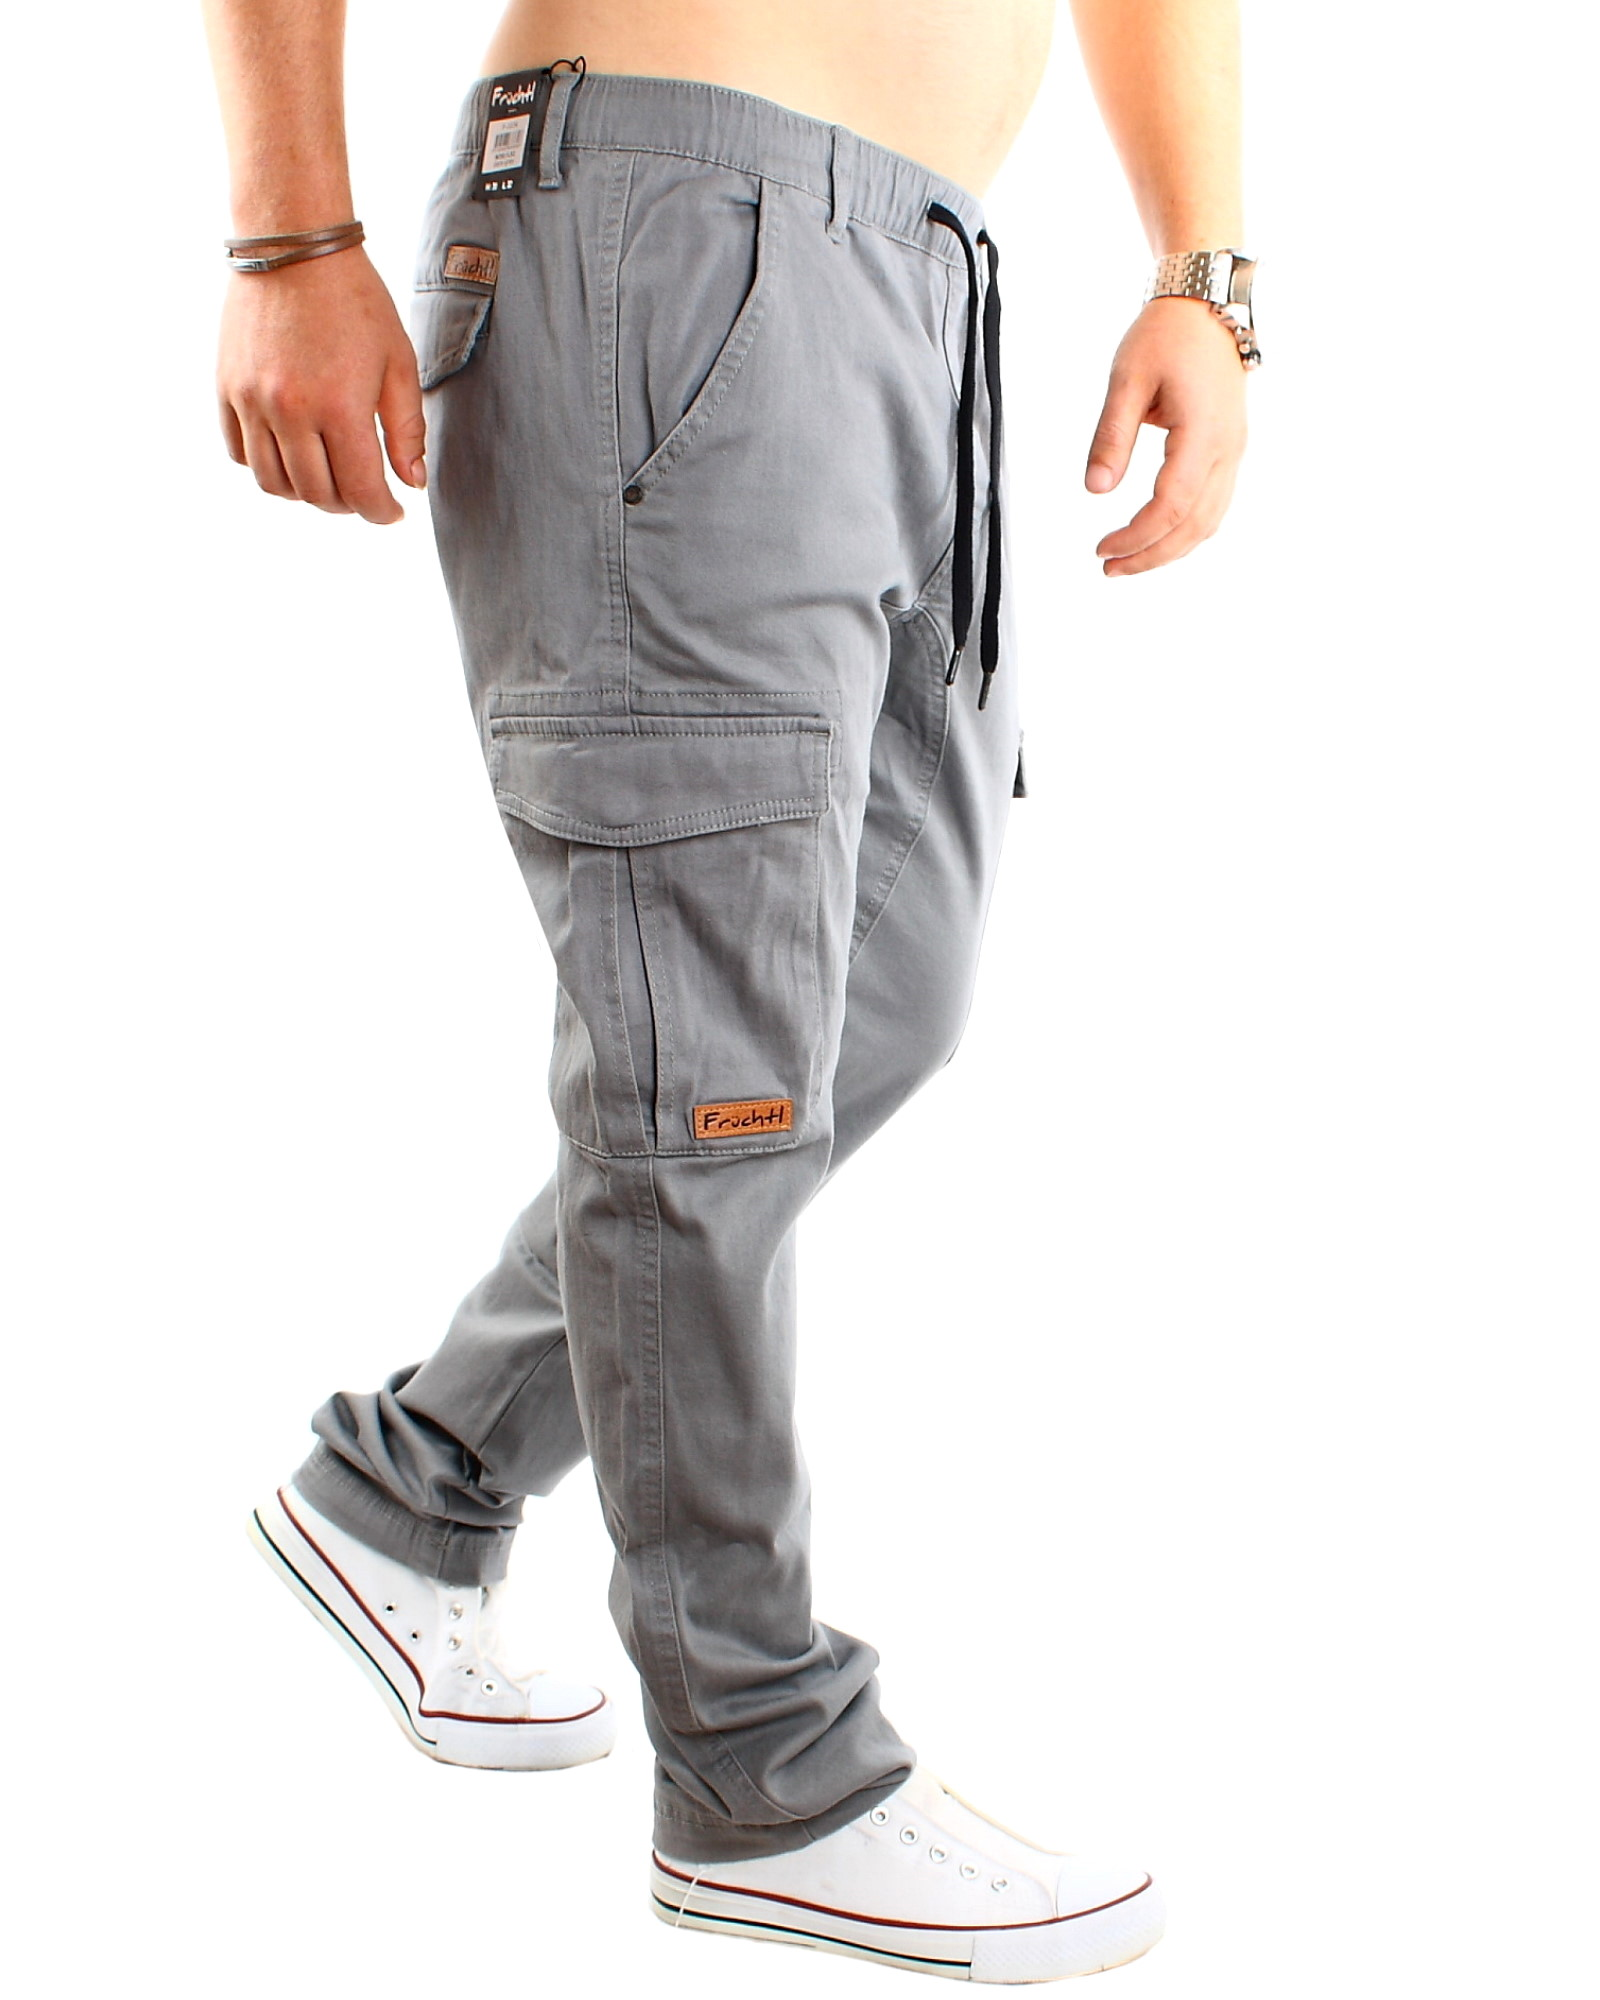 Herren Camouflage Cargohose Chino Hose Jogger Jeans Jogginghose Stretch Pants DE